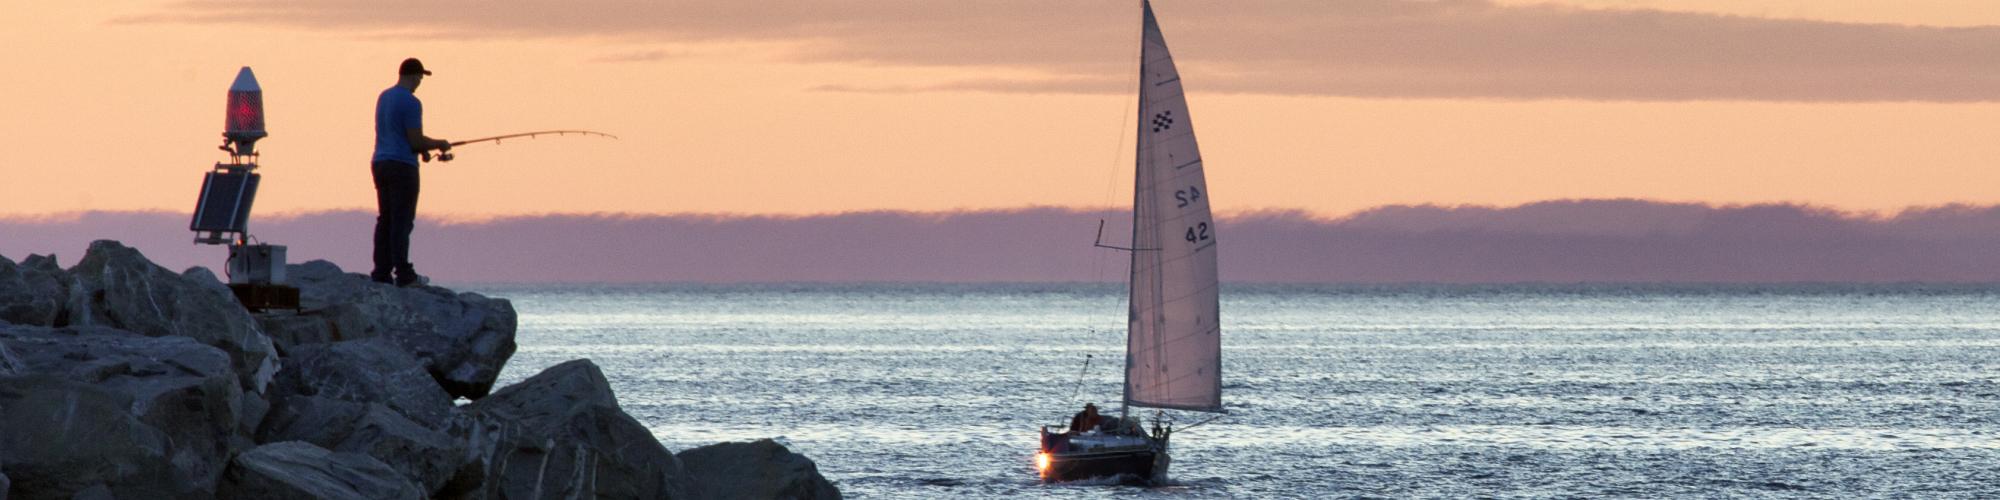 Sailboat, fisherman, by the sea